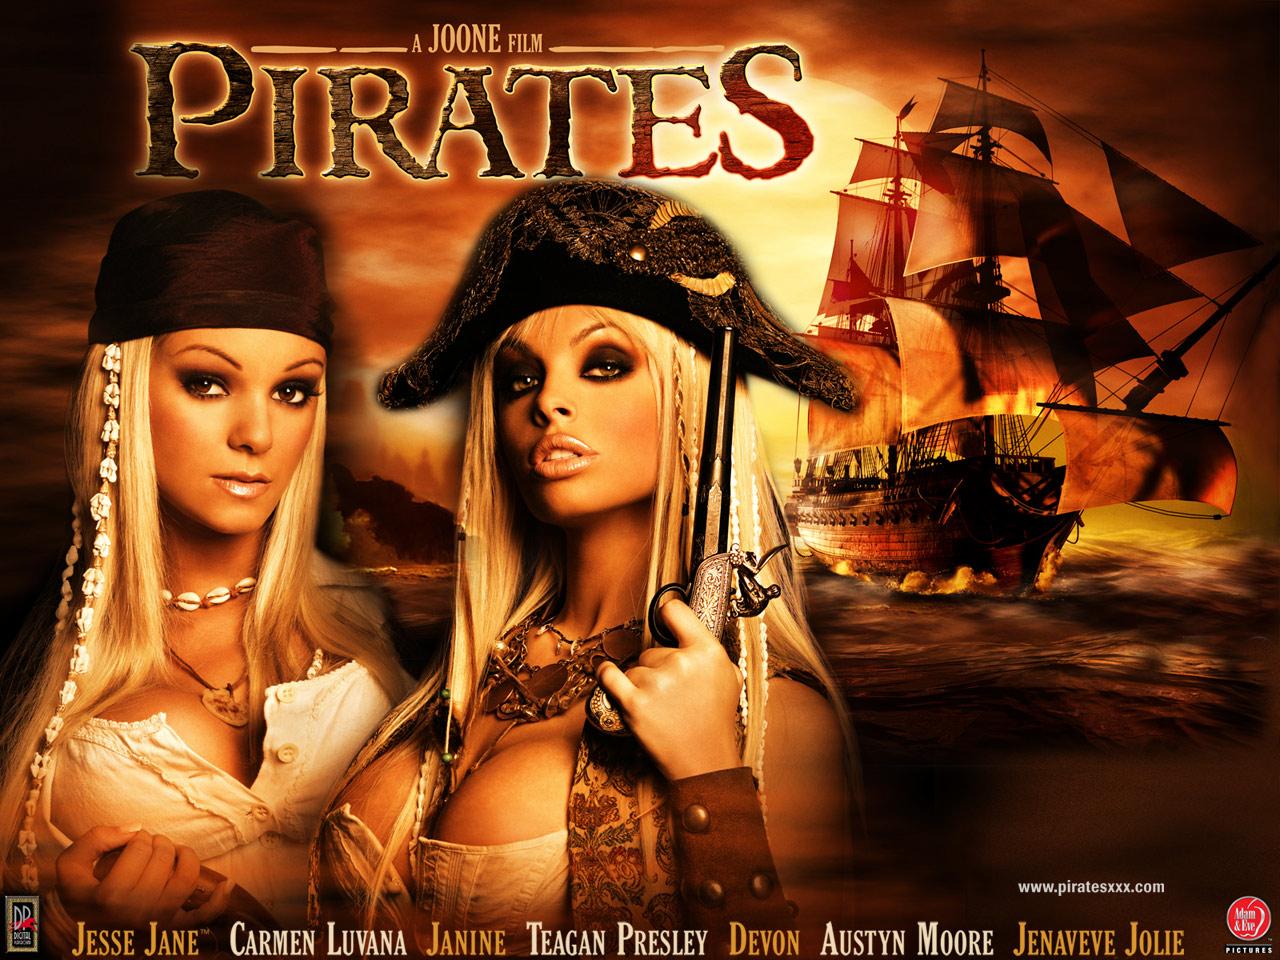 Pirates 1 Porn Movie